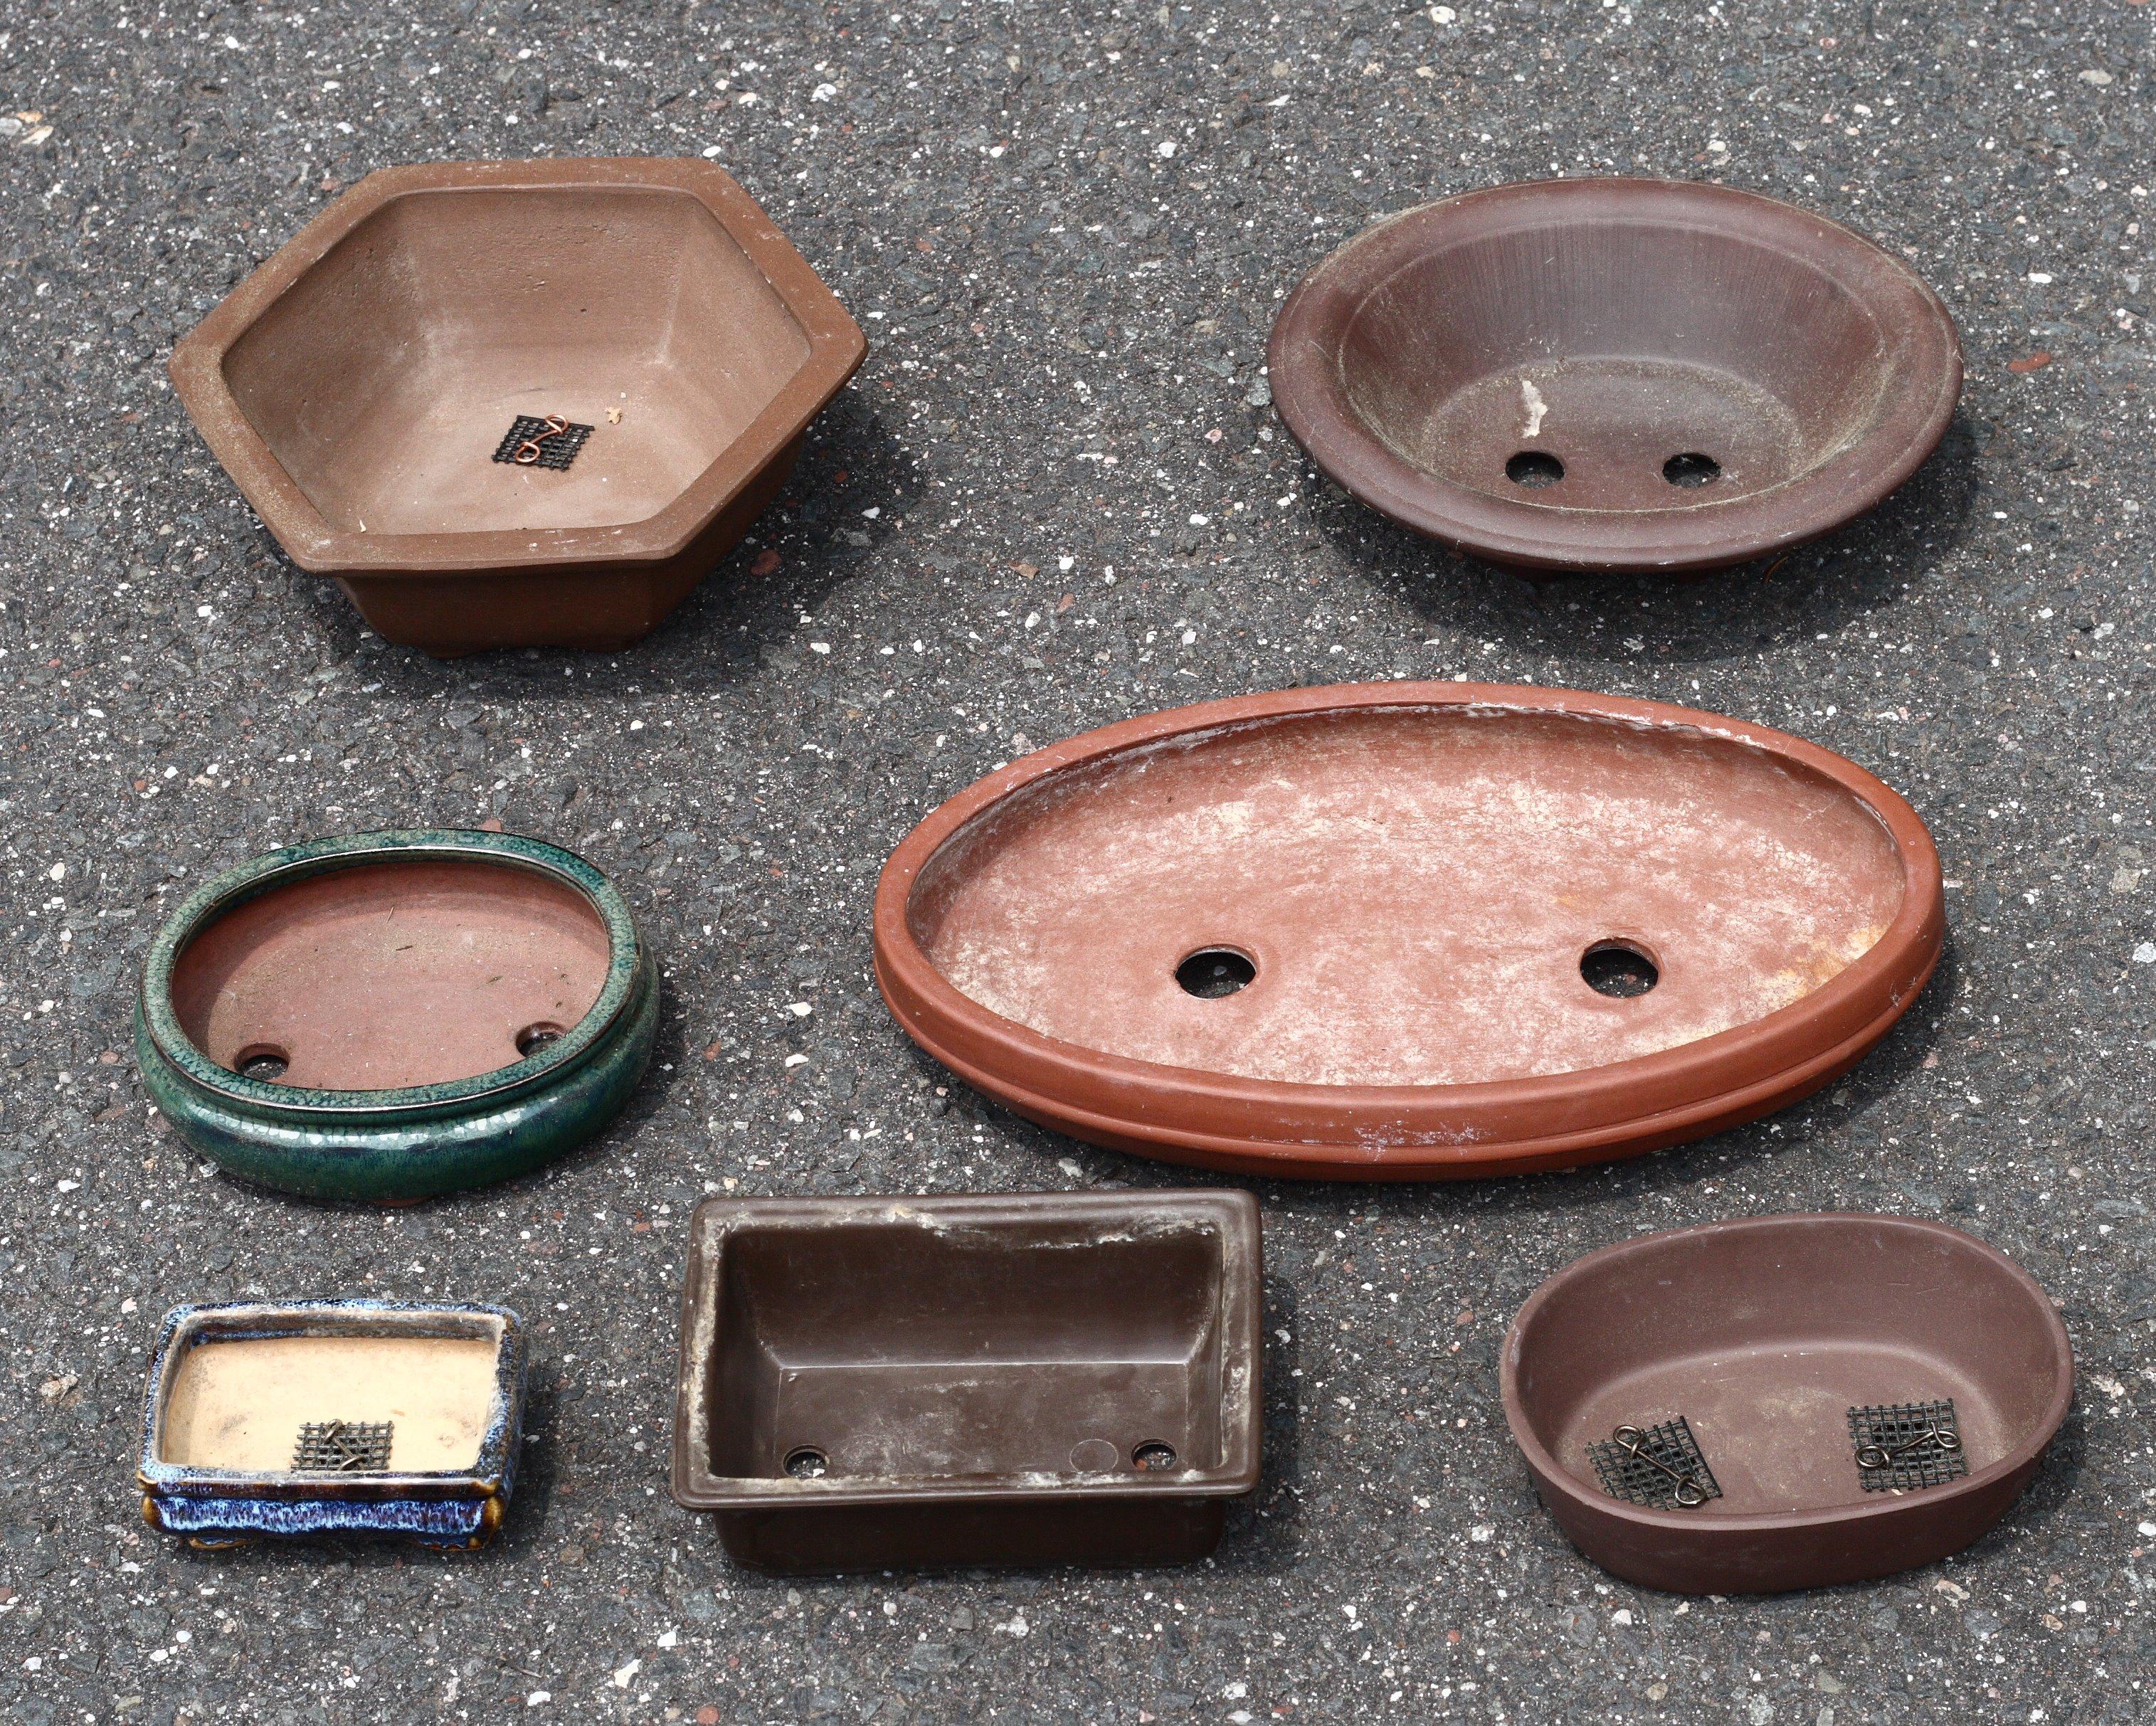 File:Assorted bonsai pots.jpg.